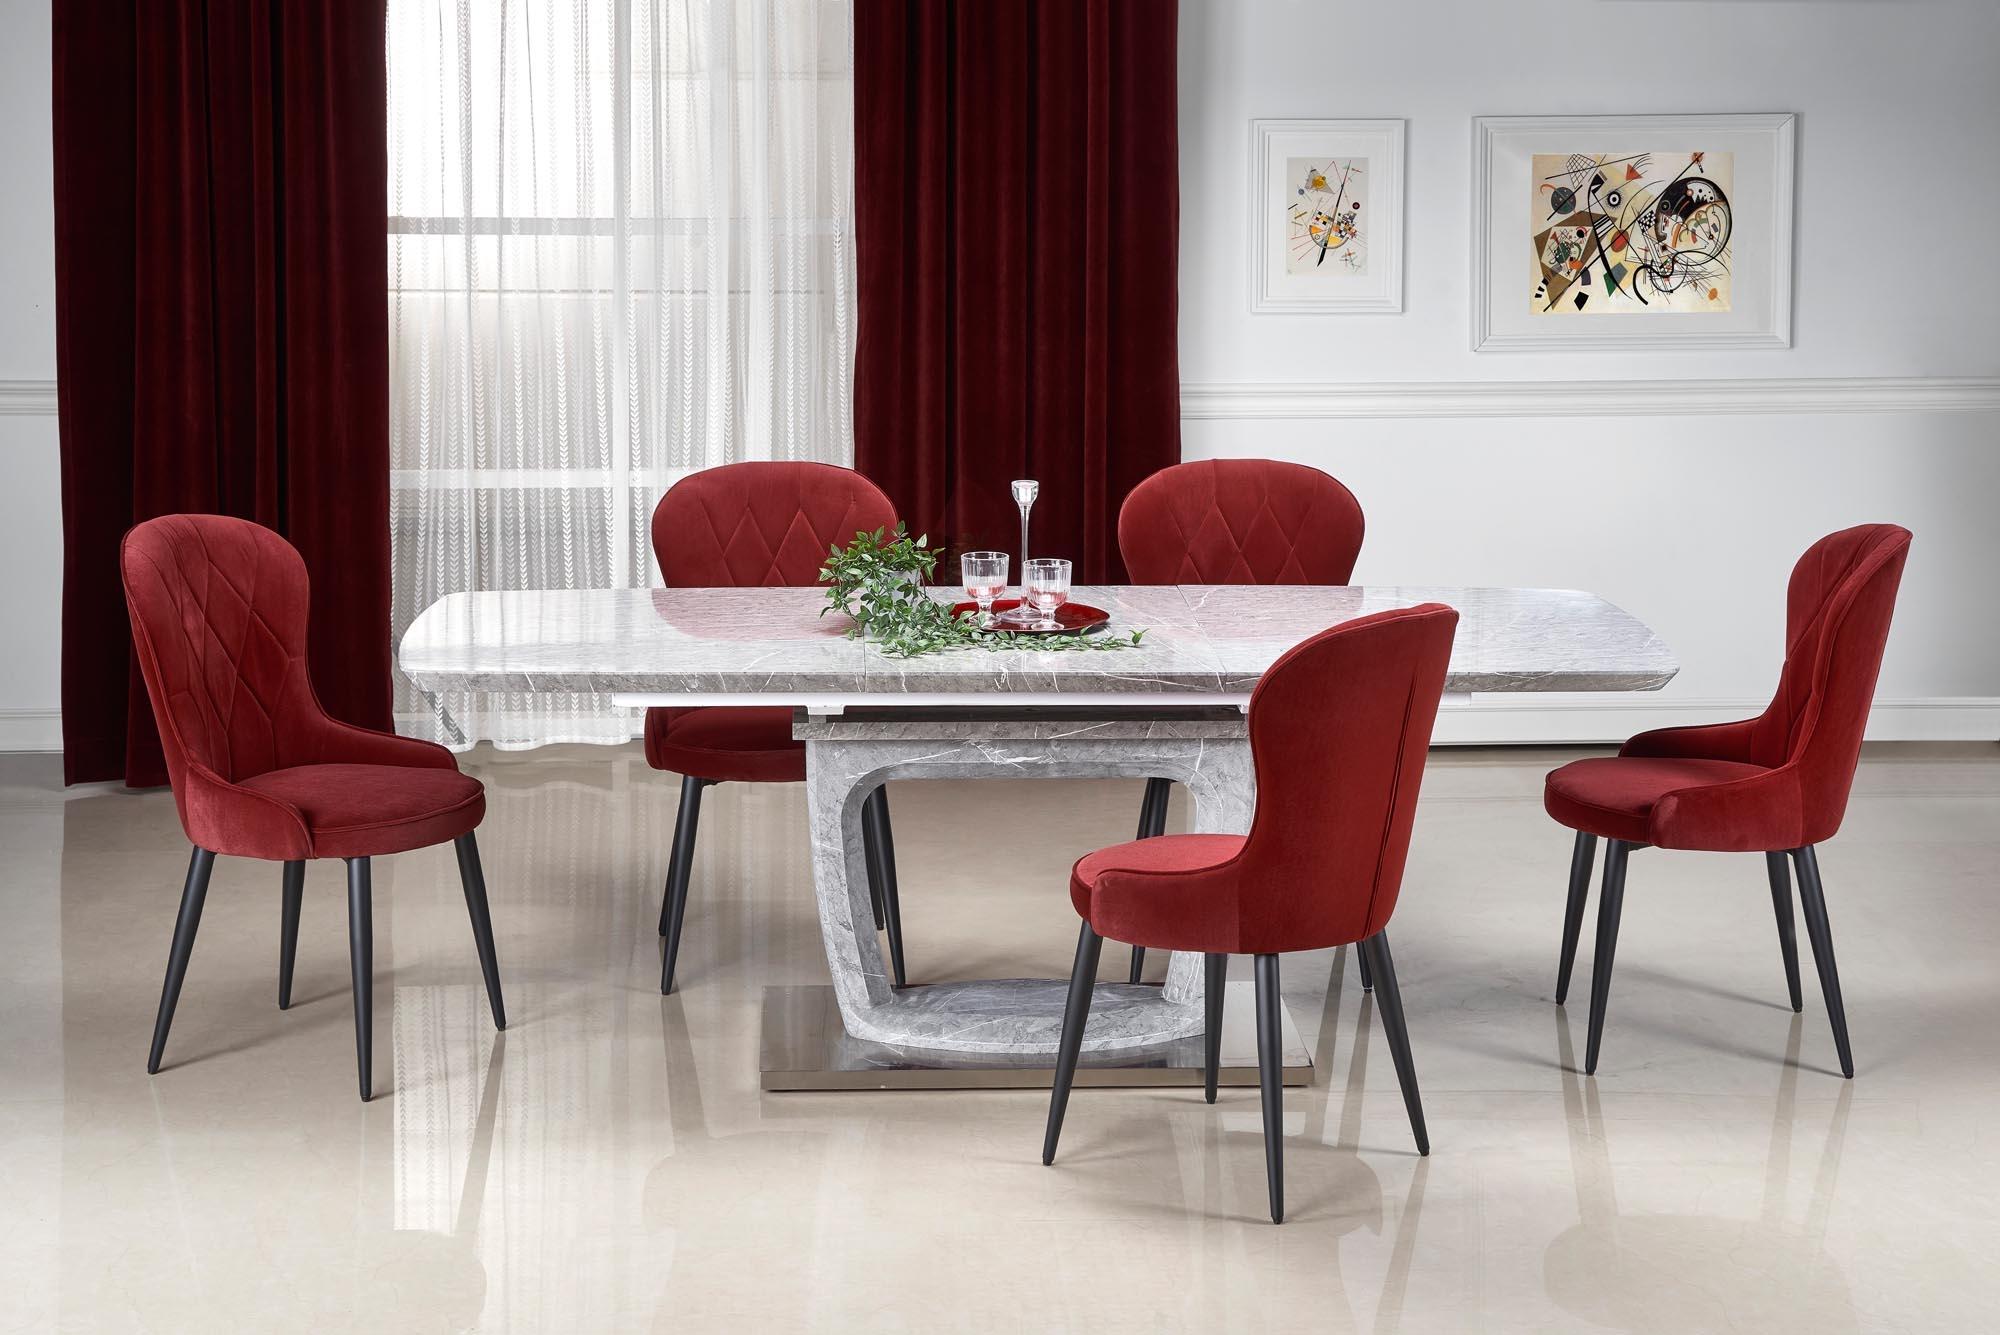 Set masa extensibila din MDF si metal Artemon Gri + 6 scaune tapitate cu stofa K366 Bordeaux / Negru, L160-220xl90xH76 cm imagine